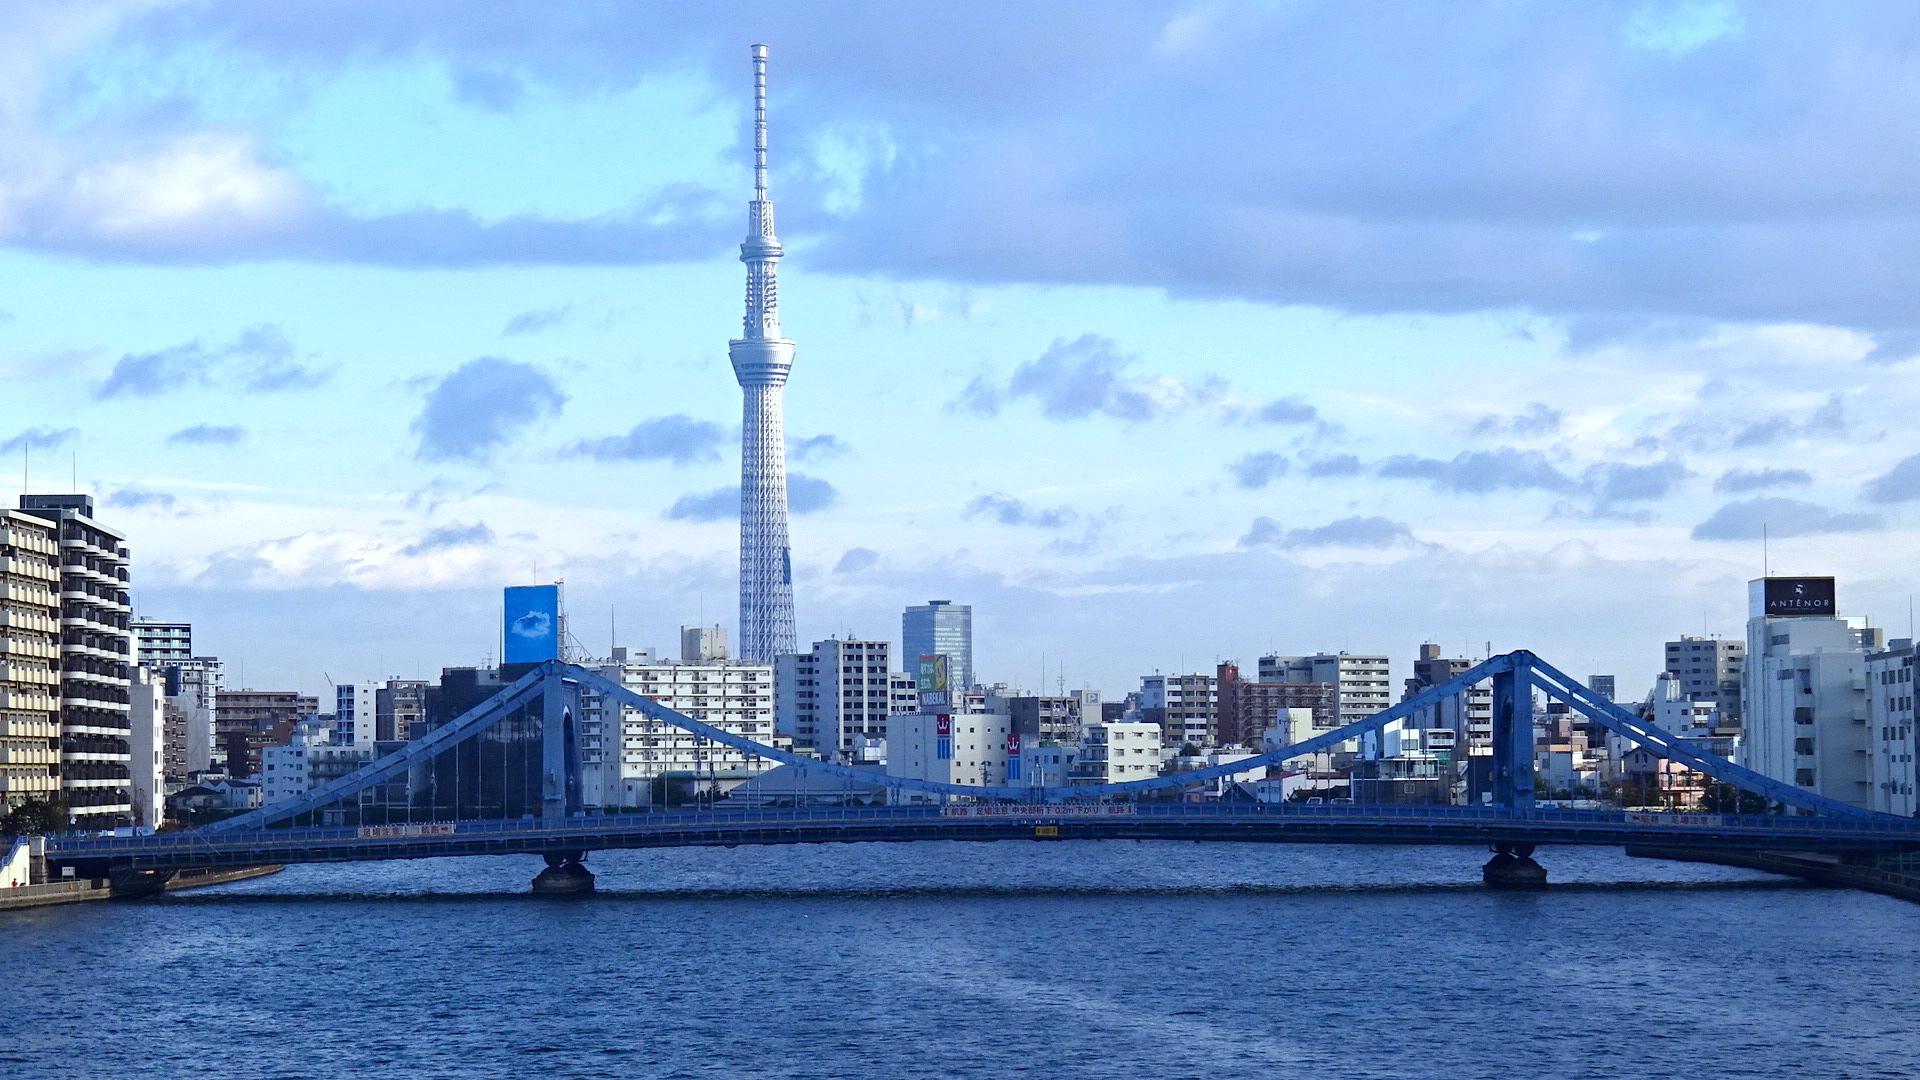 https://cdn-ak2.f.st-hatena.com/images/fotolife/s/shioshiohida/20171111/20171111074816_original.jpg